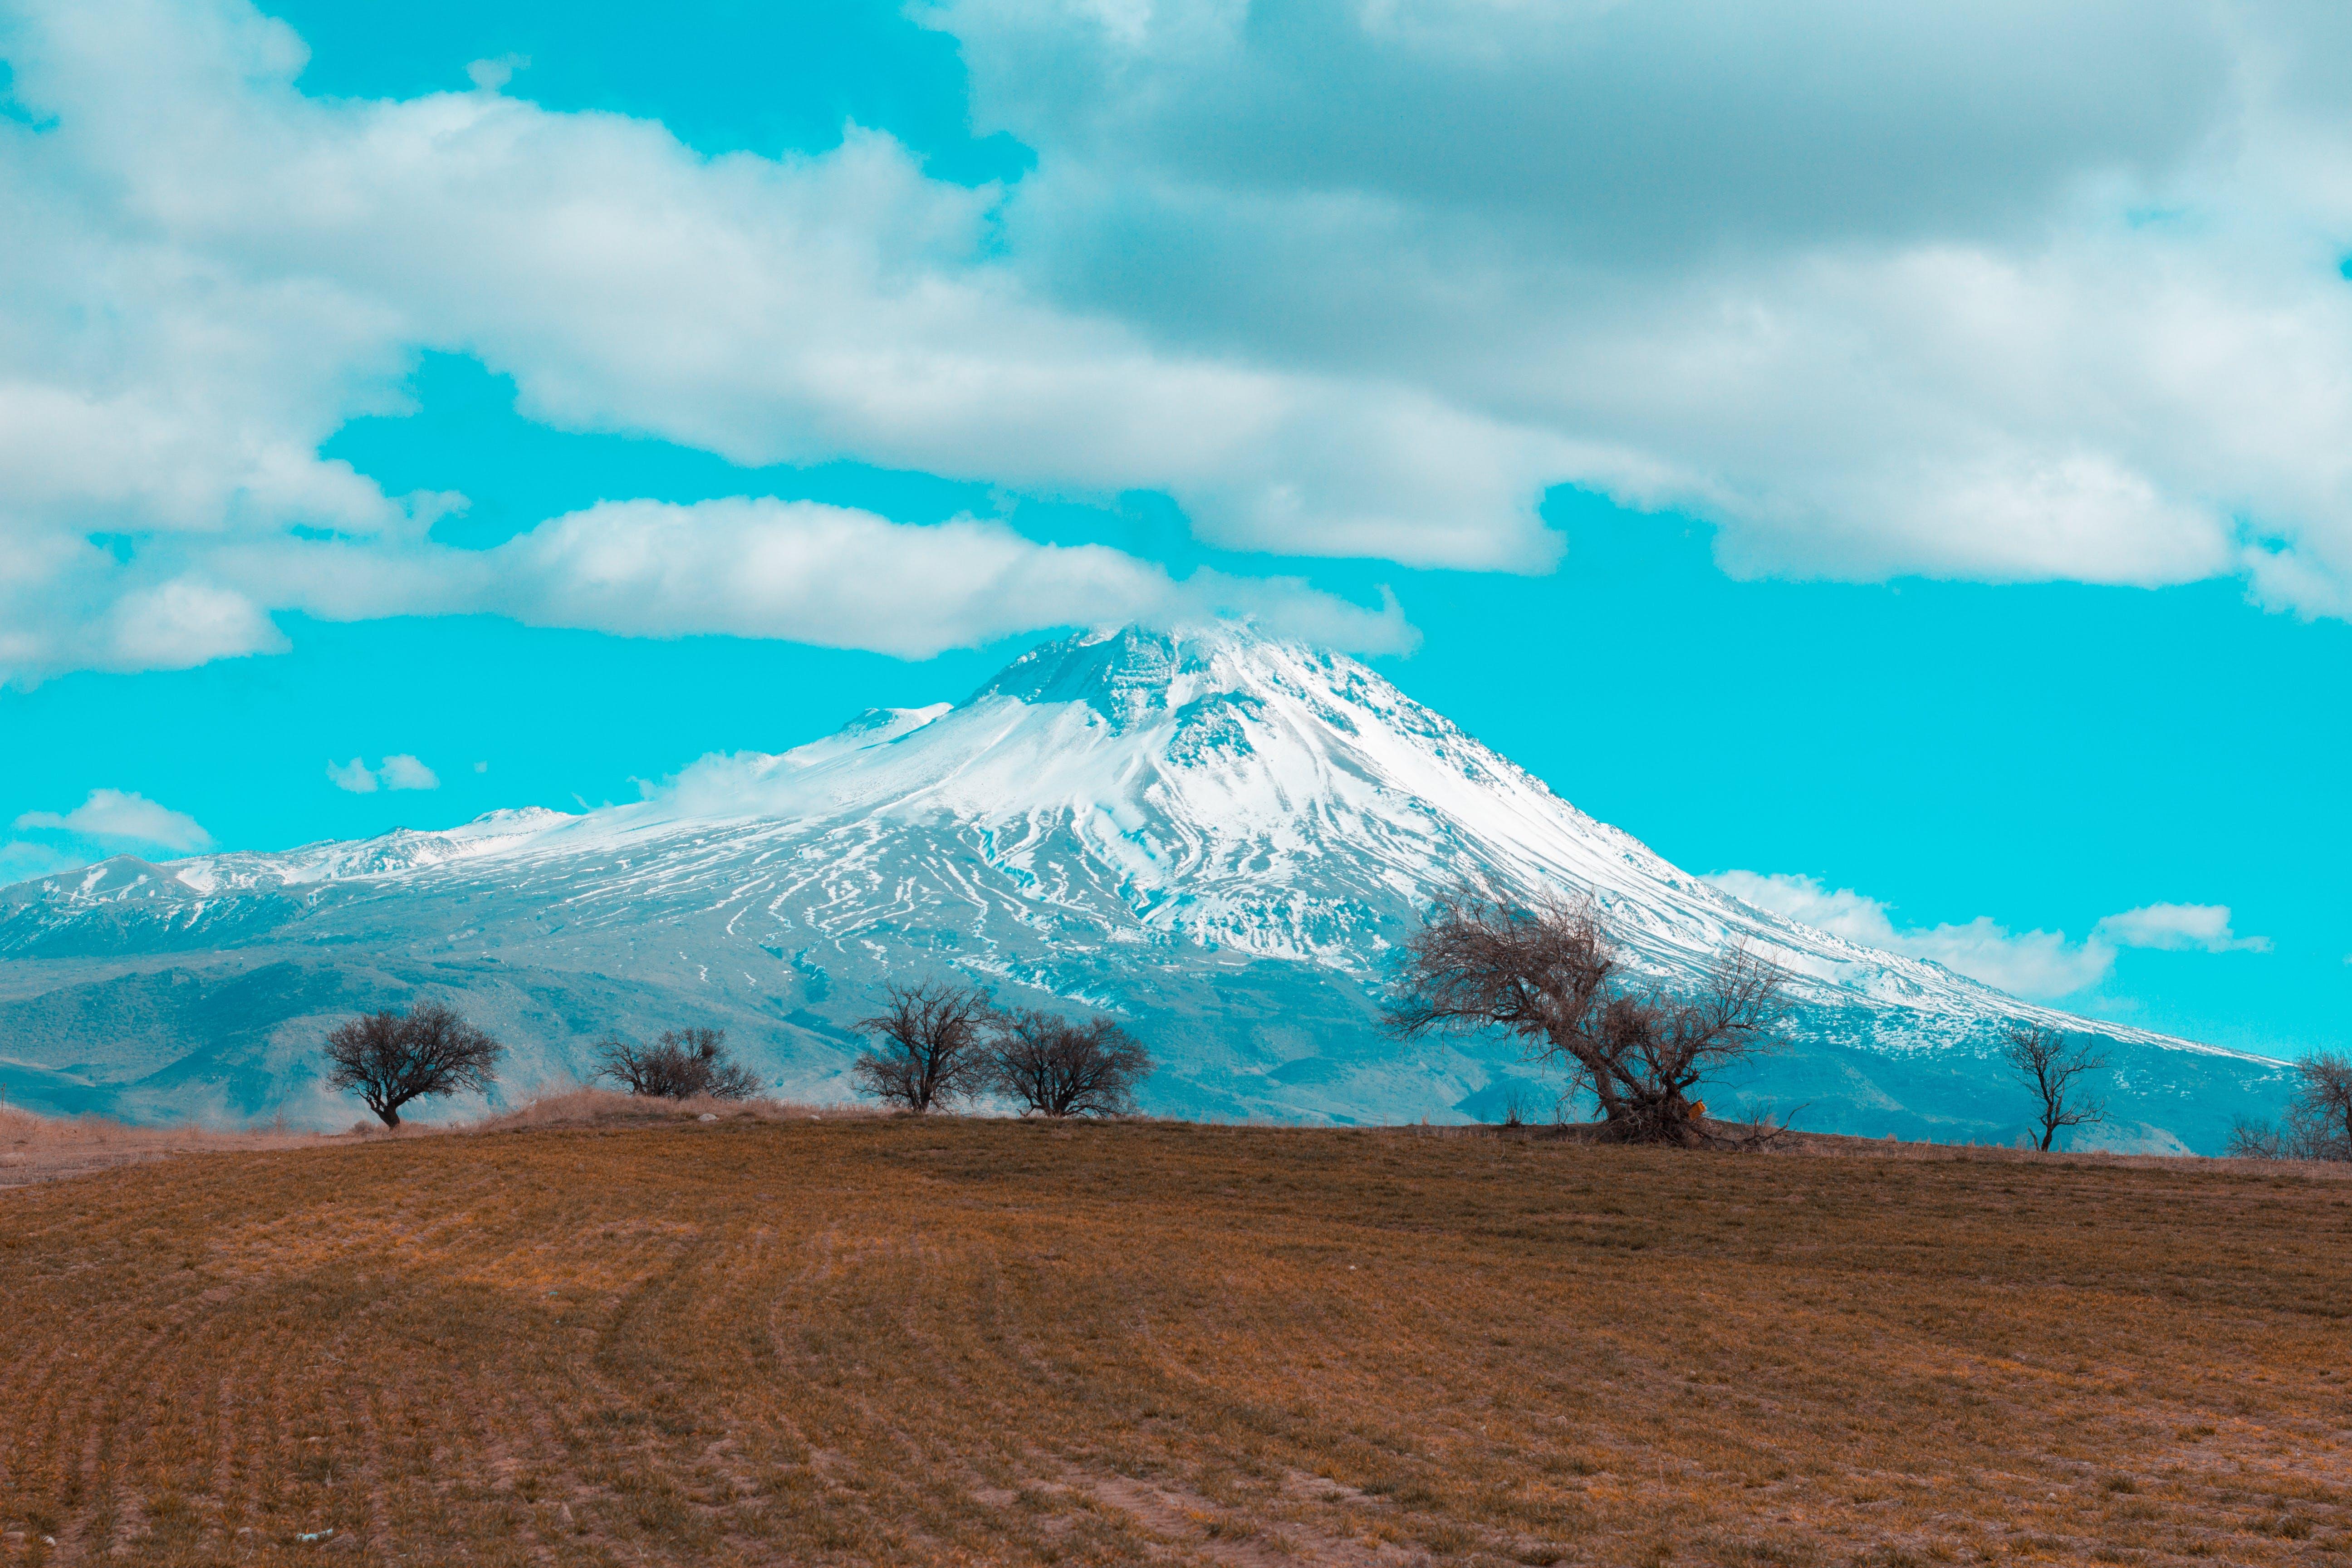 Landscape Photo of Volcano